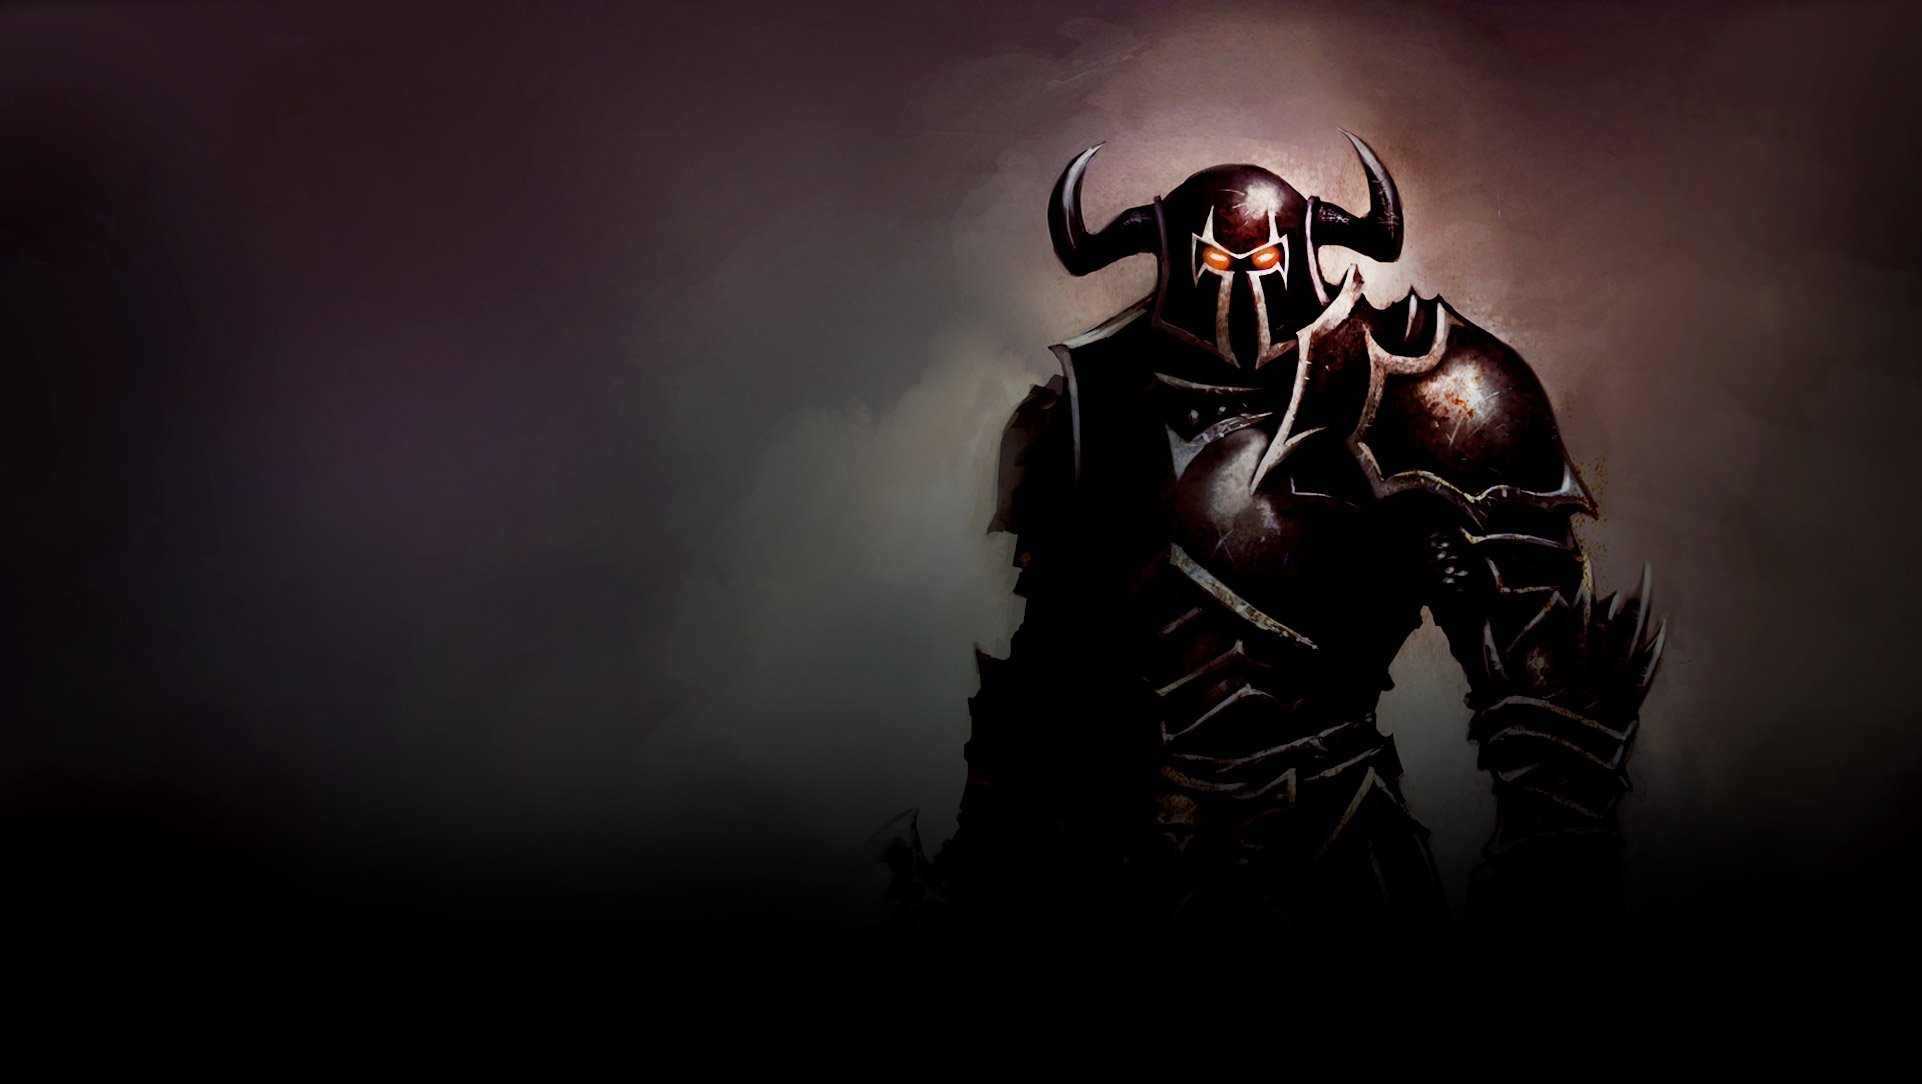 Baldur's Gate Enhanced Edition in September